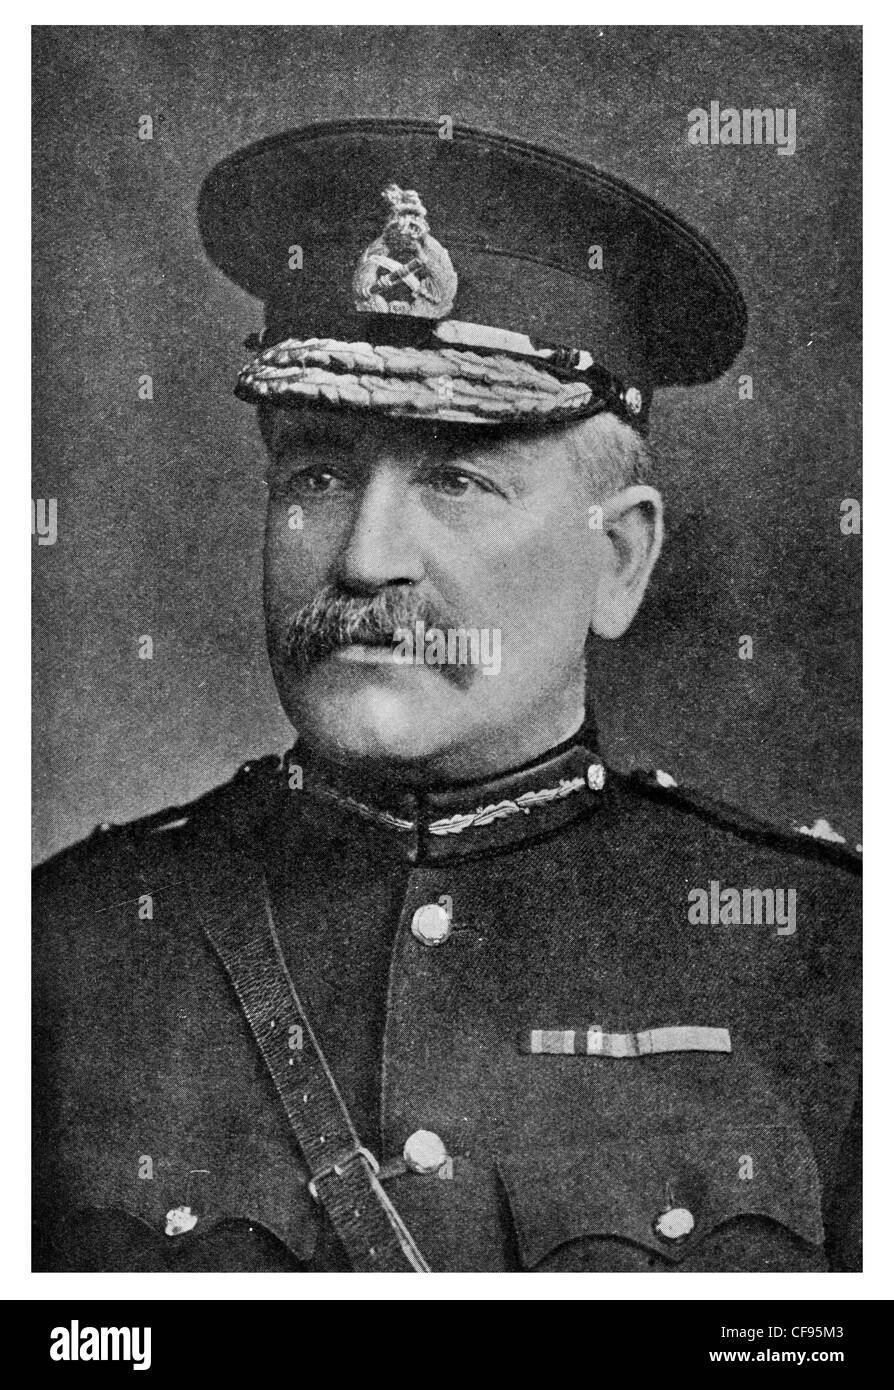 General Sir Charles Carmichael Monro, 1st Baronet of Bearcrofts, GCB, GCSI, GCMG, British Army General during World - Stock Image